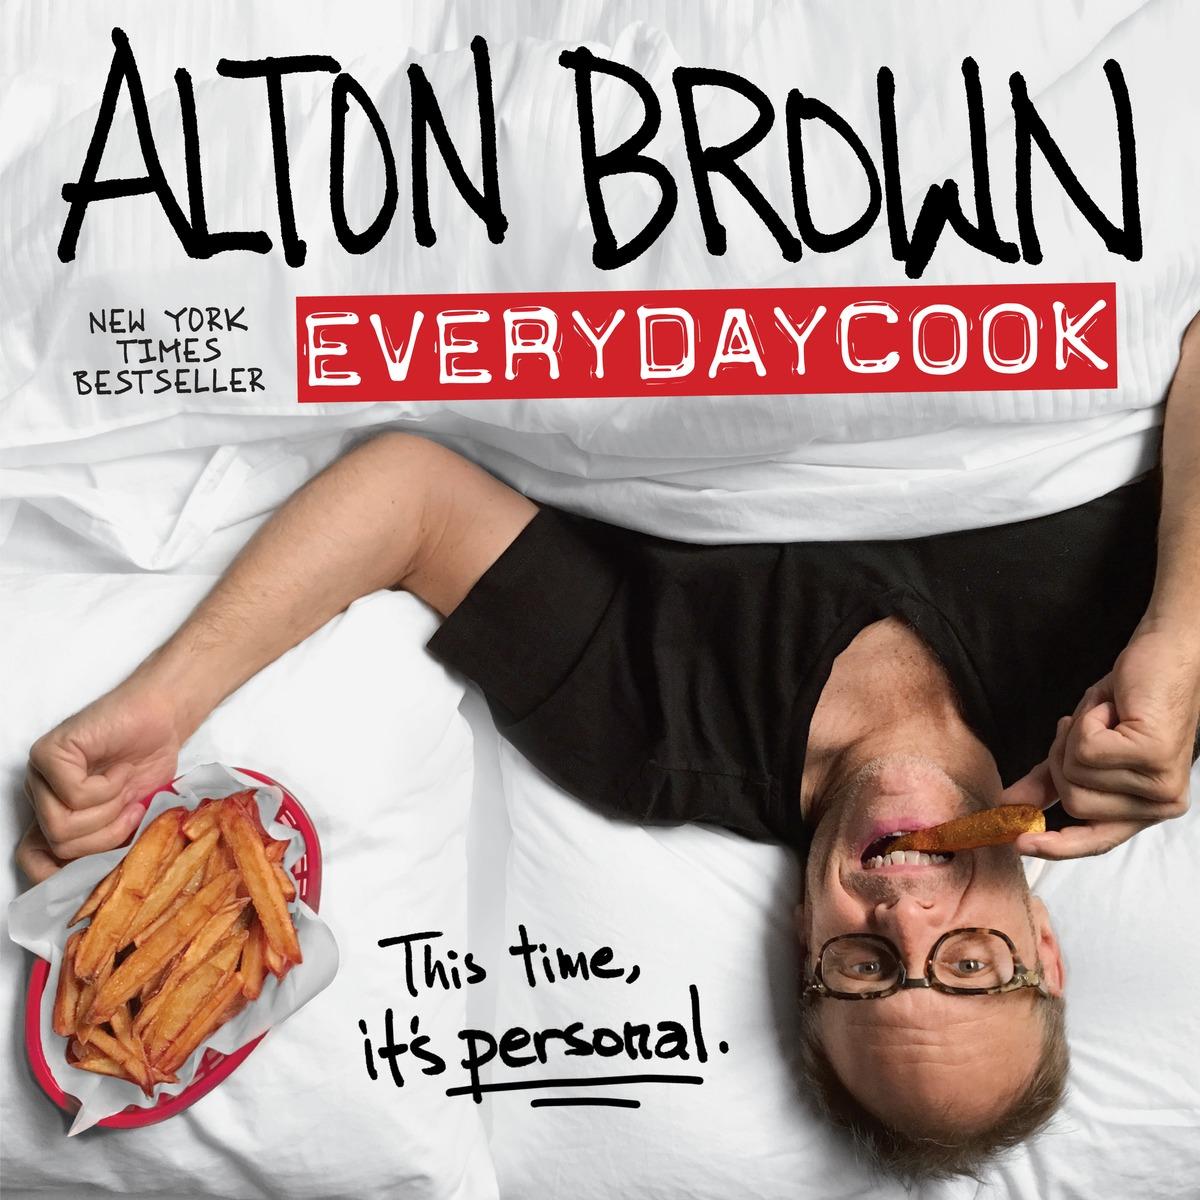 Alton Brown: EveryDayCook hack